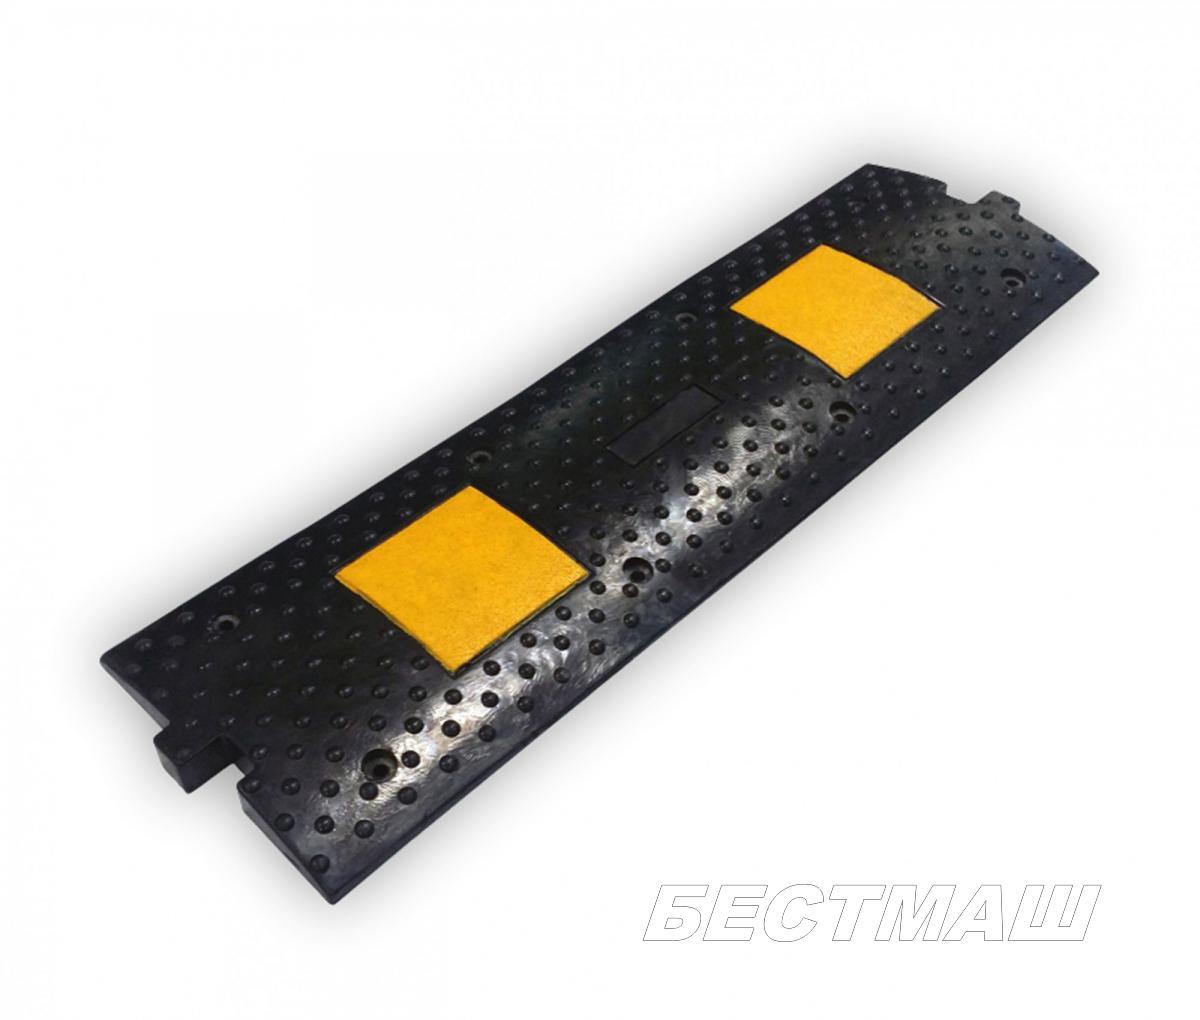 Серединный элемент резина 300*1000 мм